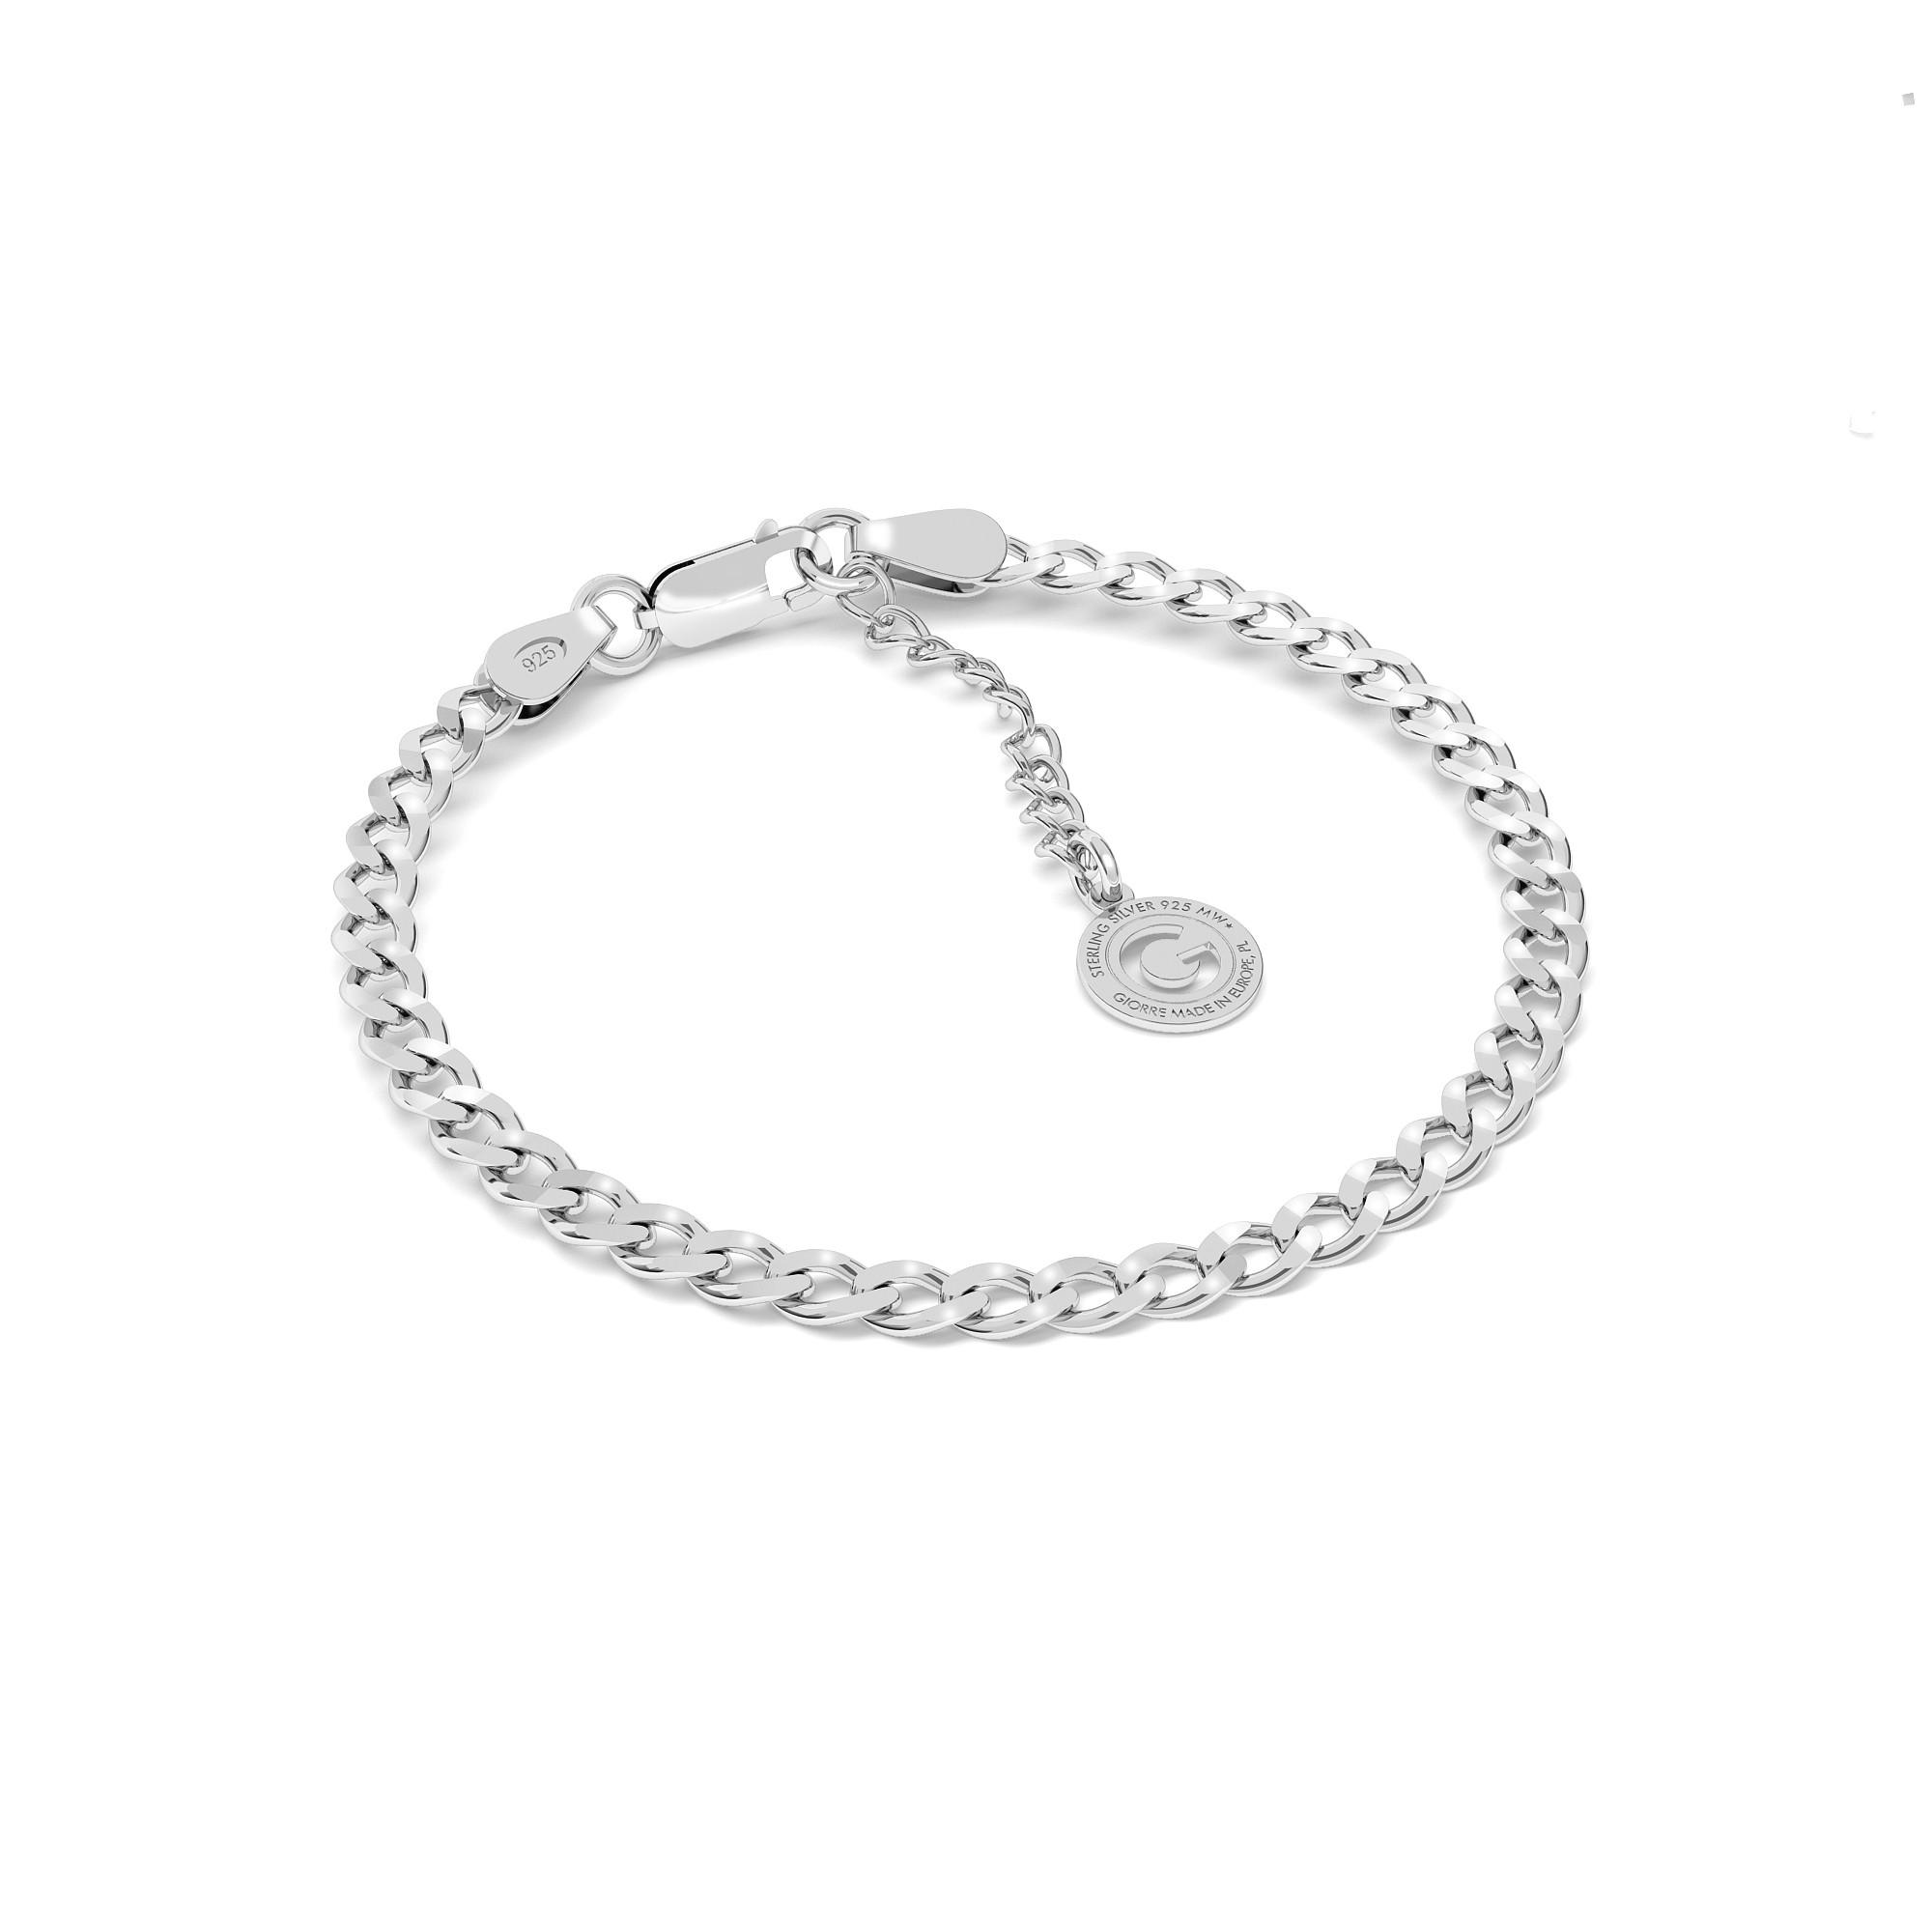 Srebrna bransoletka łańcuszkowa pancerka 925